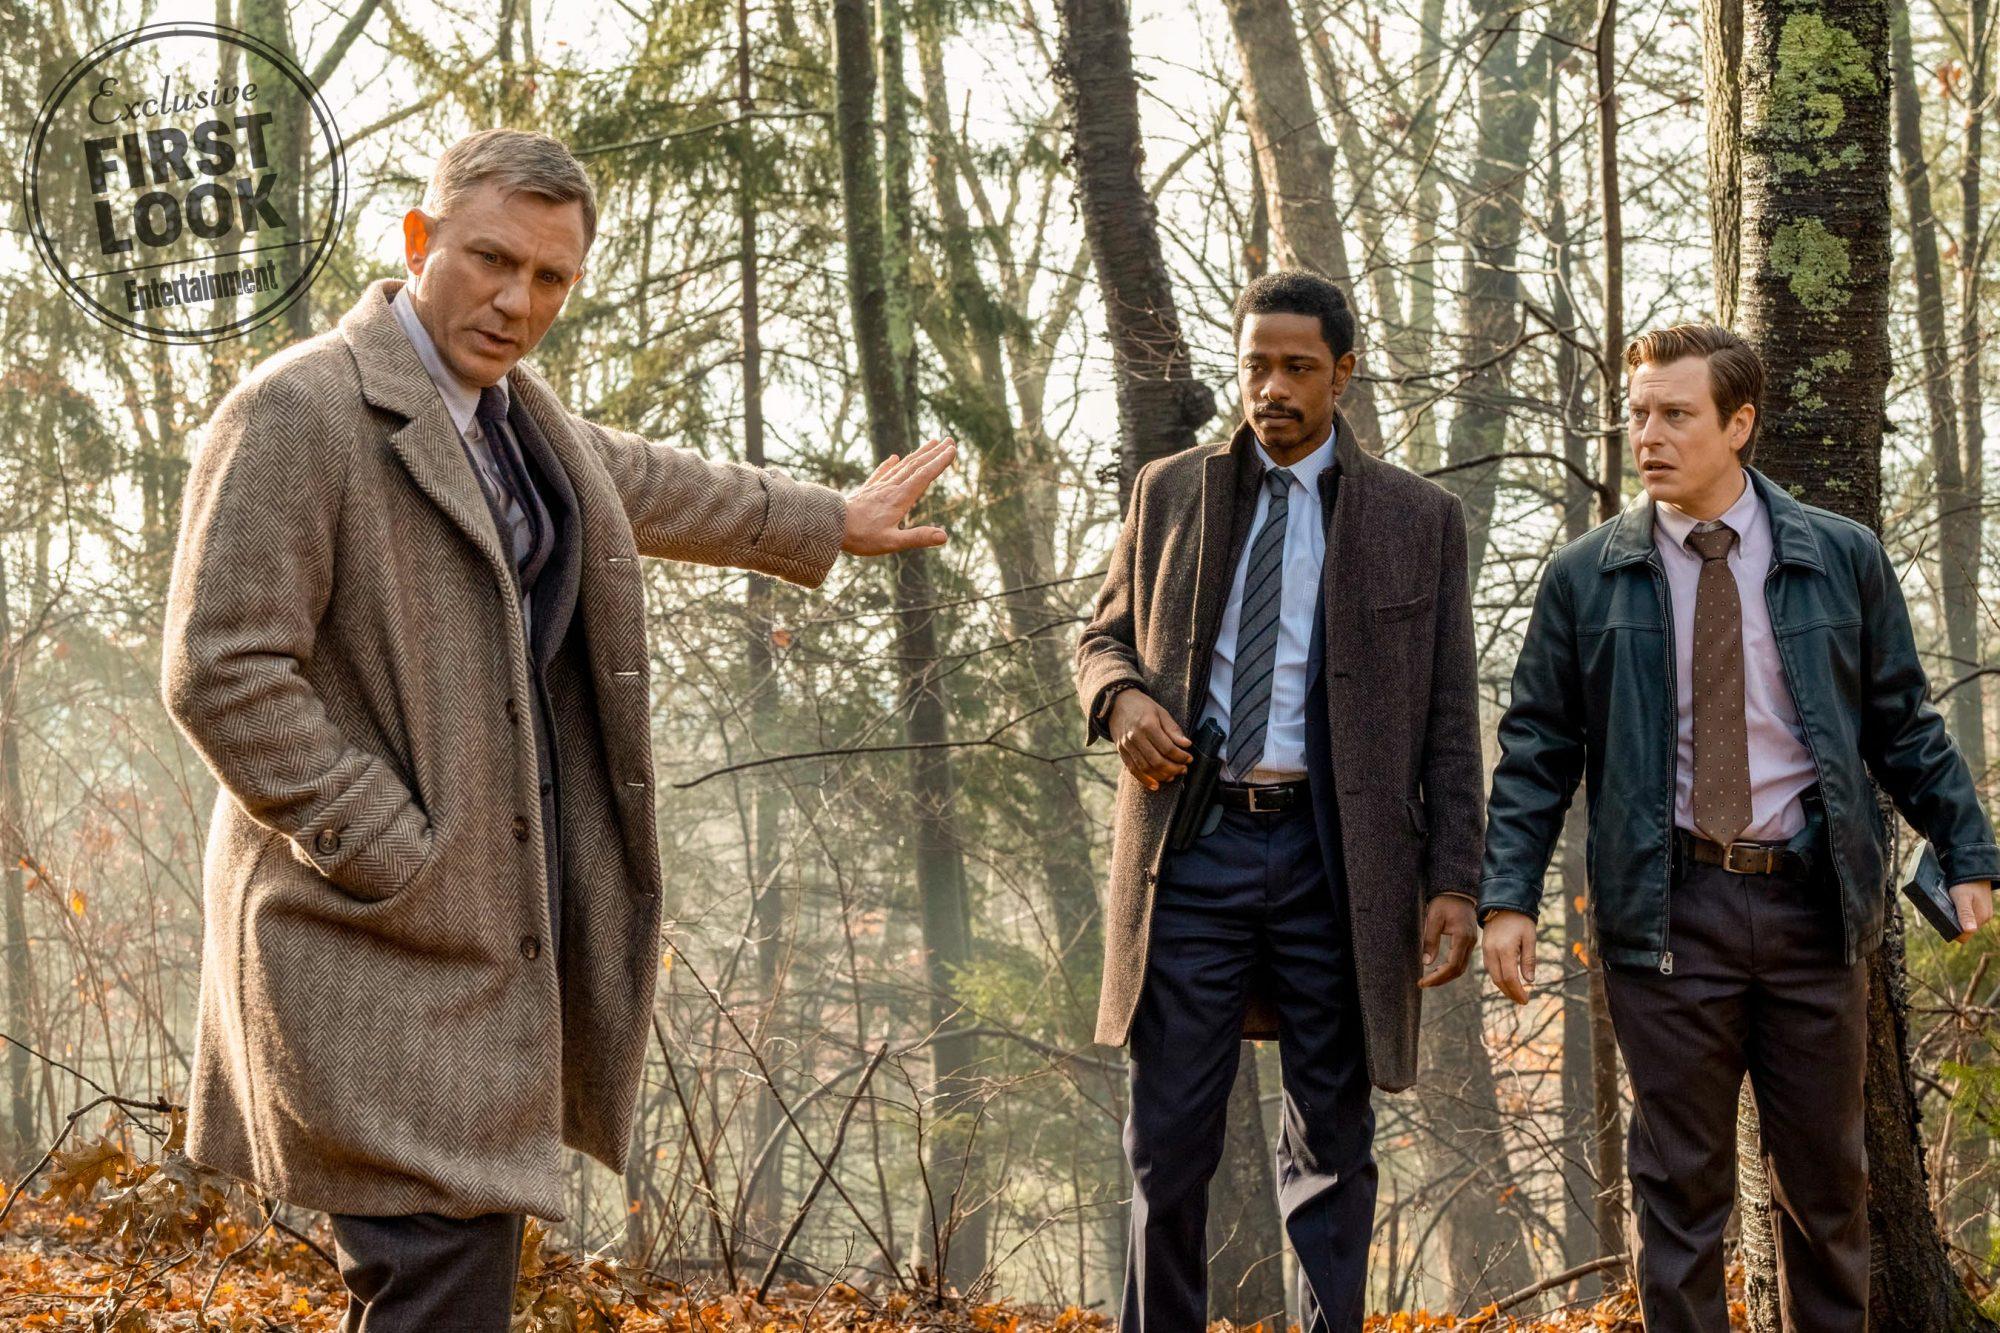 KNIVES OUT Benoit Blanc (Daniel Craig, left), Lt. Elliott (LaKeith Stanfield), Trooper Wagner (Noah Segan, right) in KNIVES OUT. CR: Claire Folger/Lionsgate